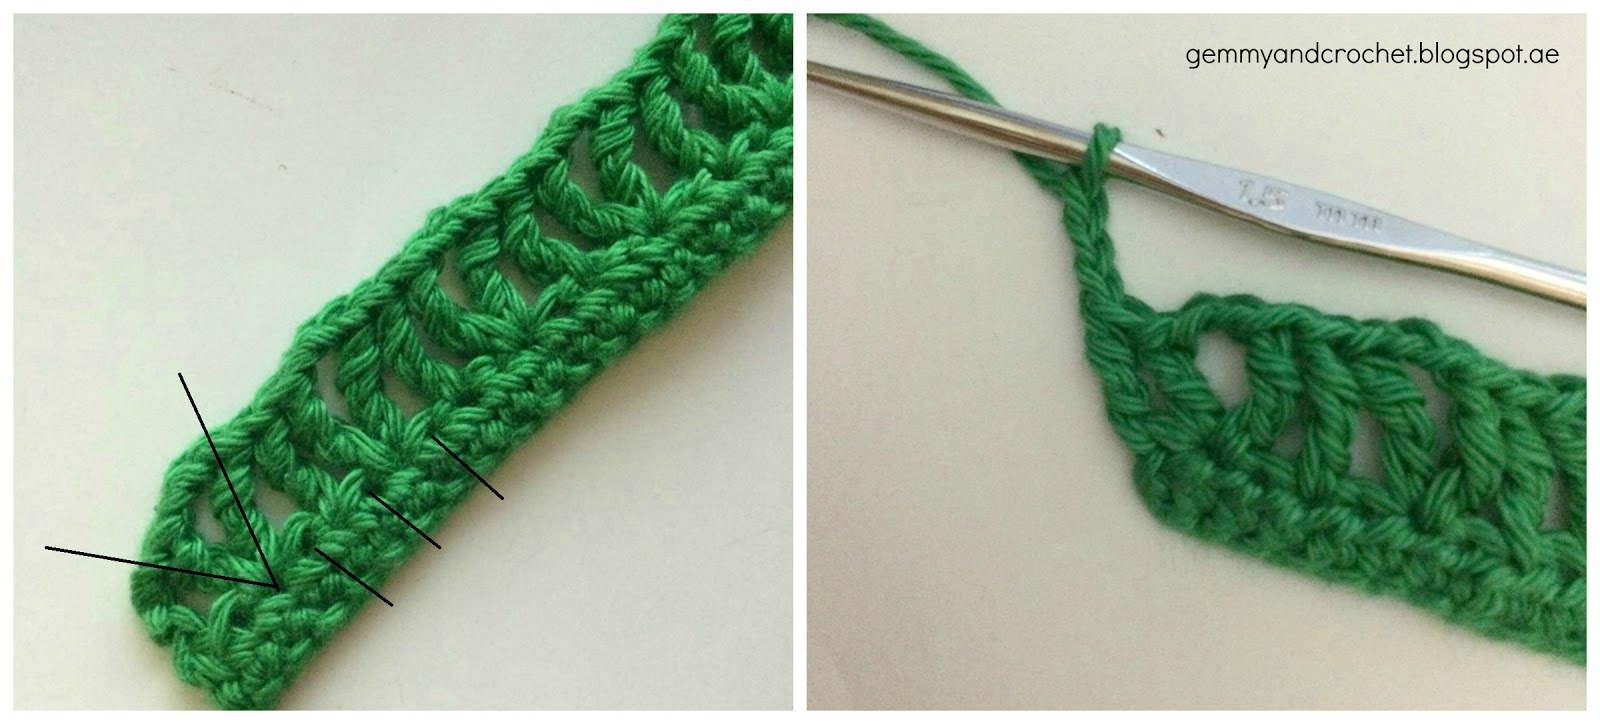 ALL ABOUT CROCHET: Free Pattern: Cozy Bib Crochet Necklace